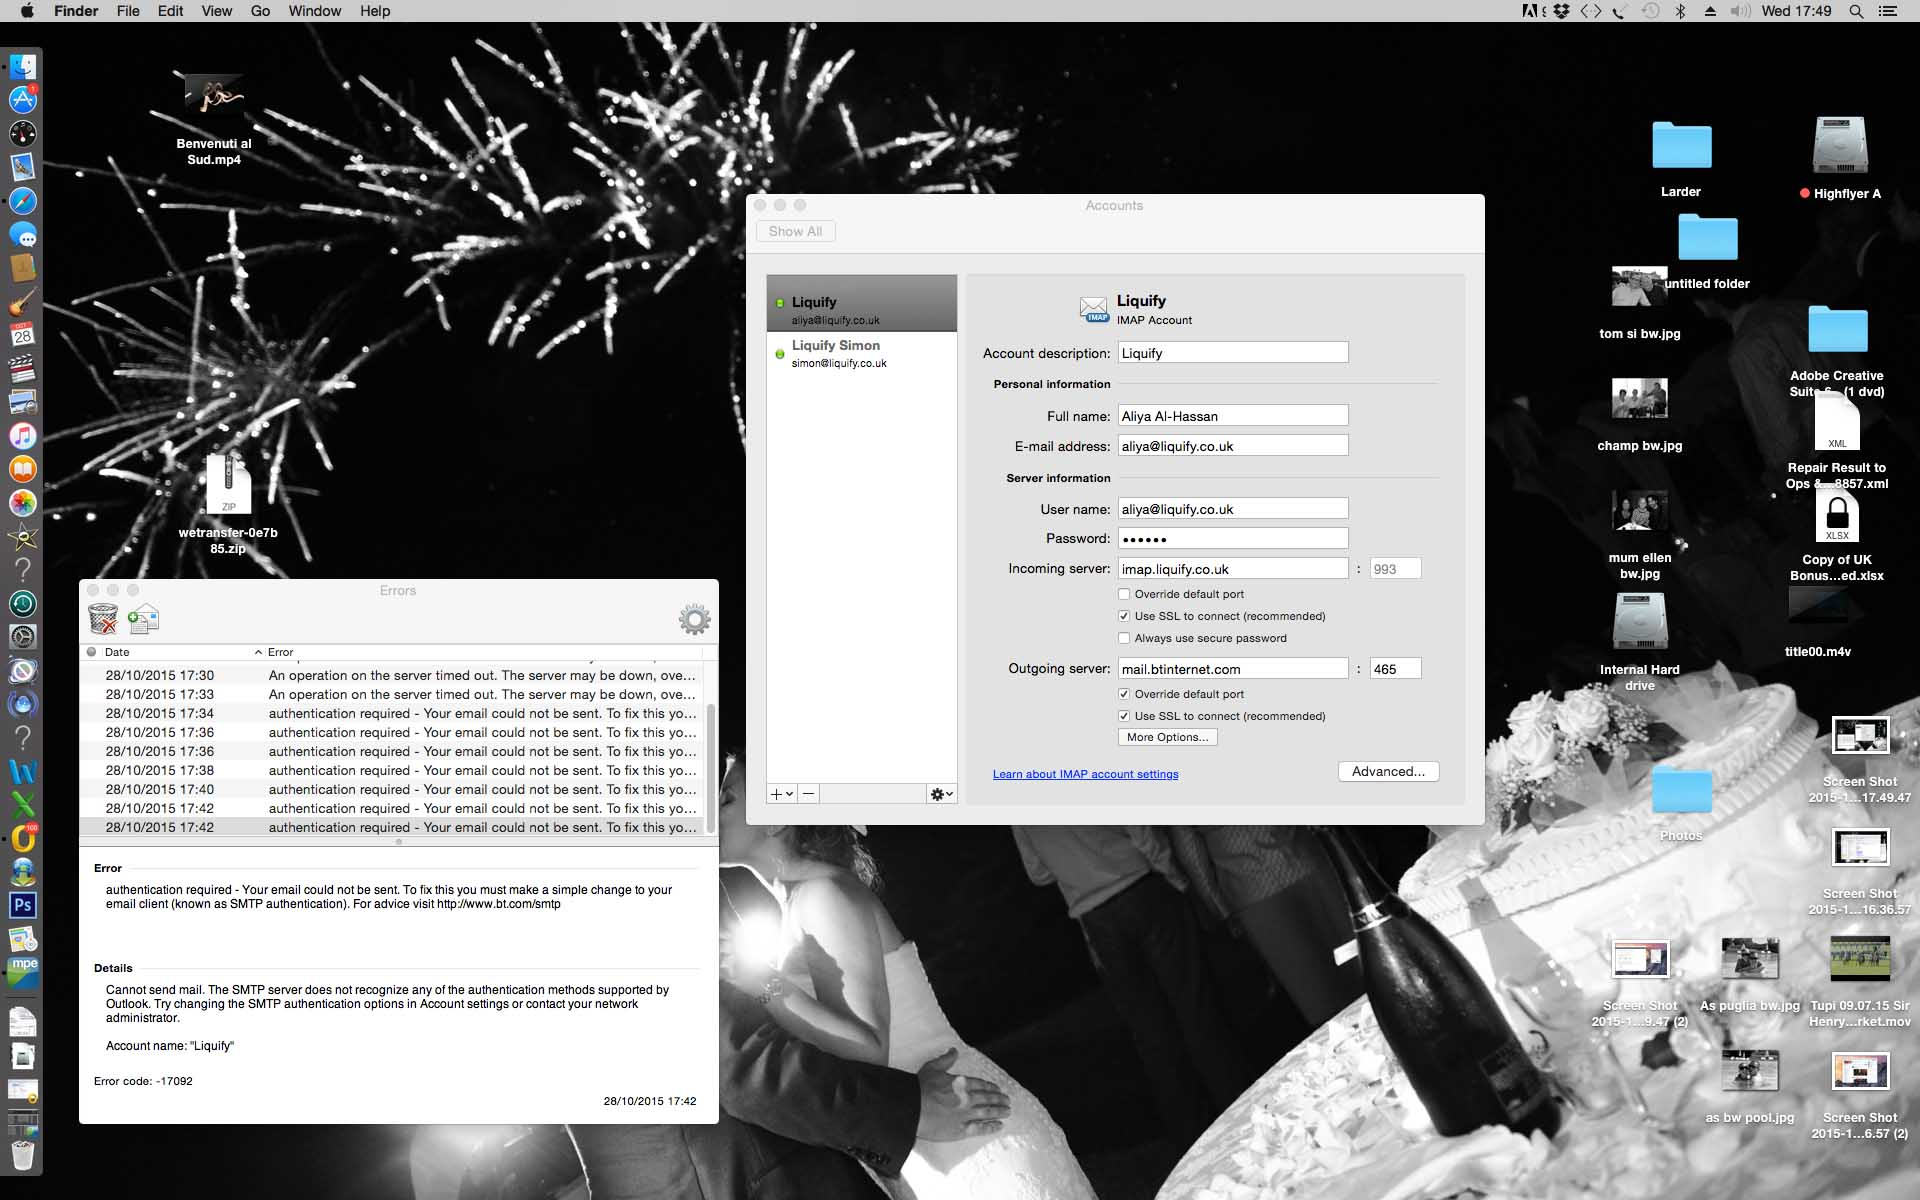 Screen Shot 2015-10-28 at 17.49.54 (2) copy.jpg